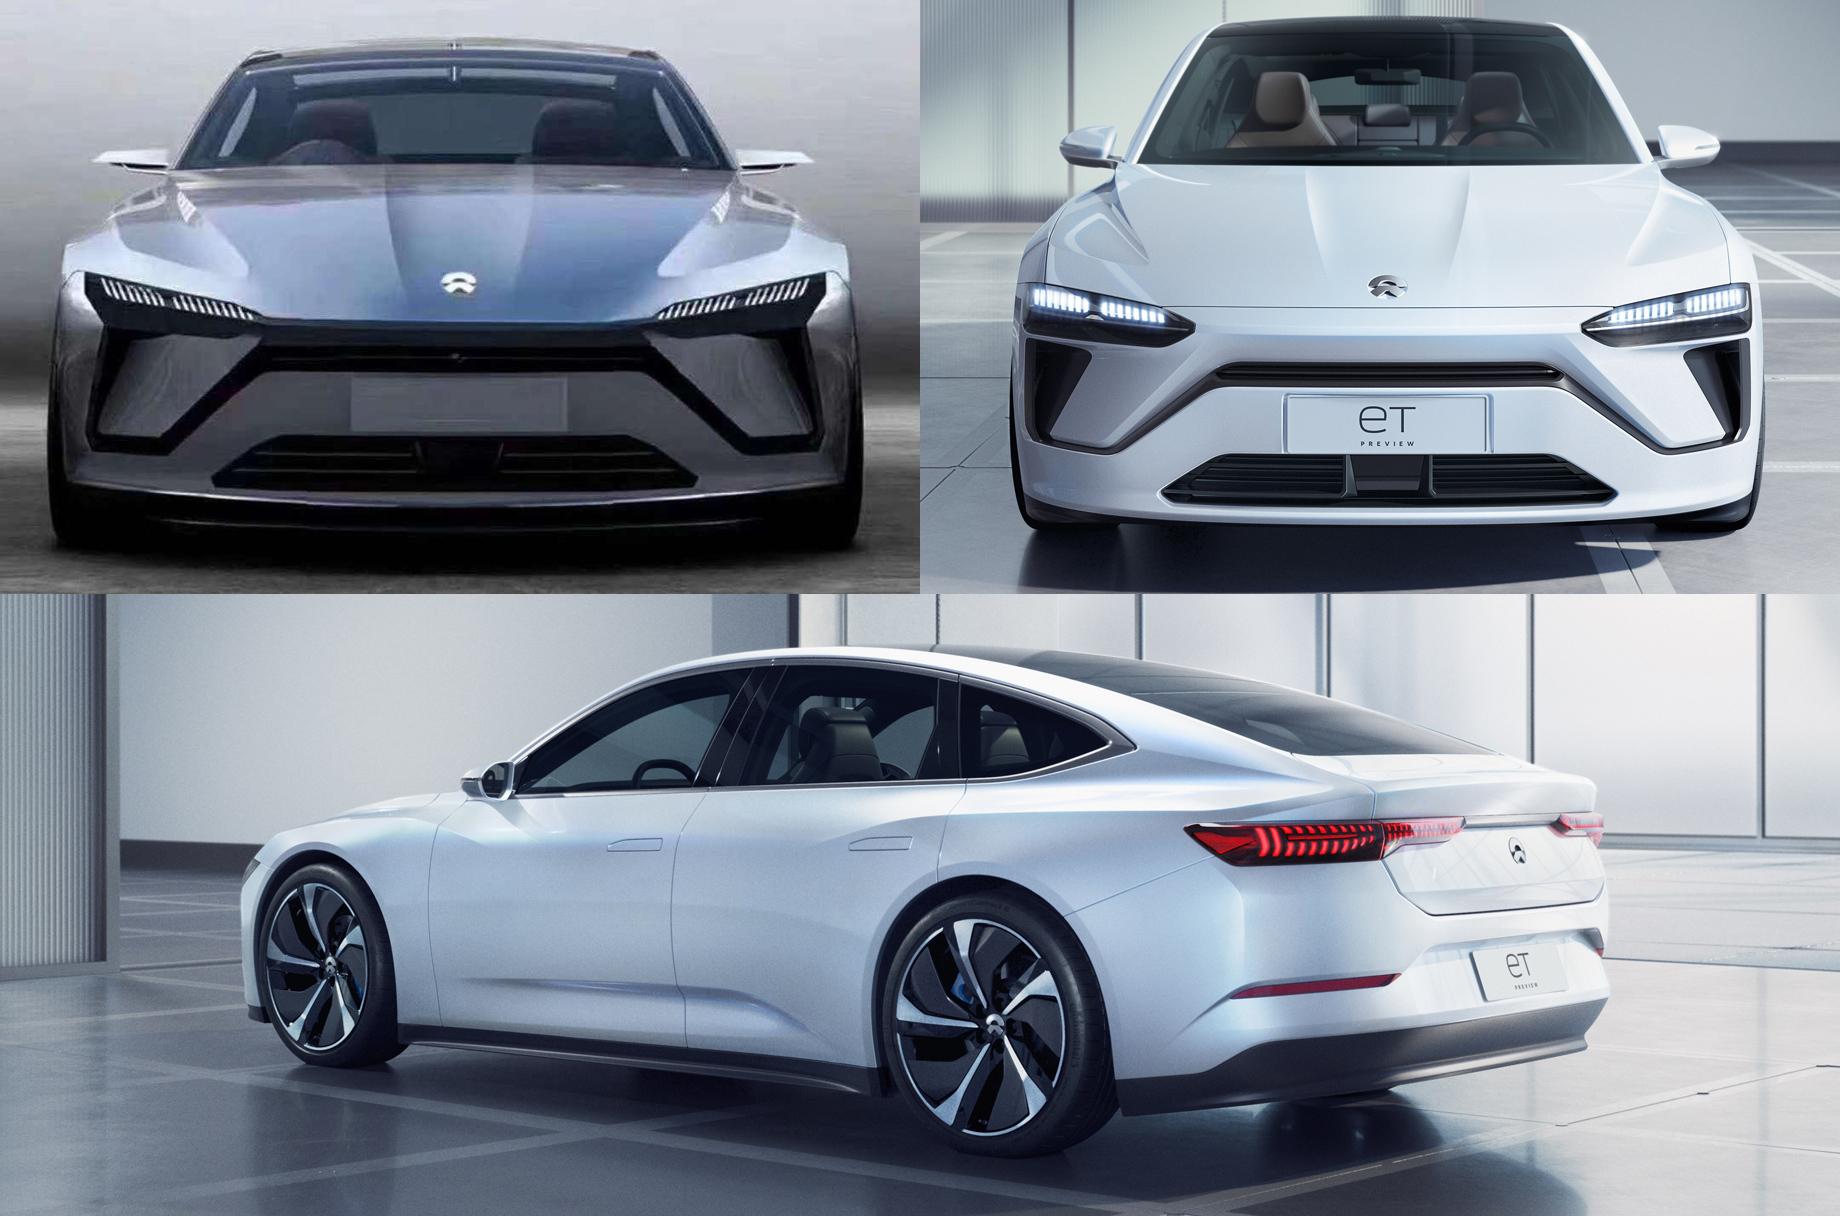 Фирма Nio представит флагманский седан вначале 2021 года